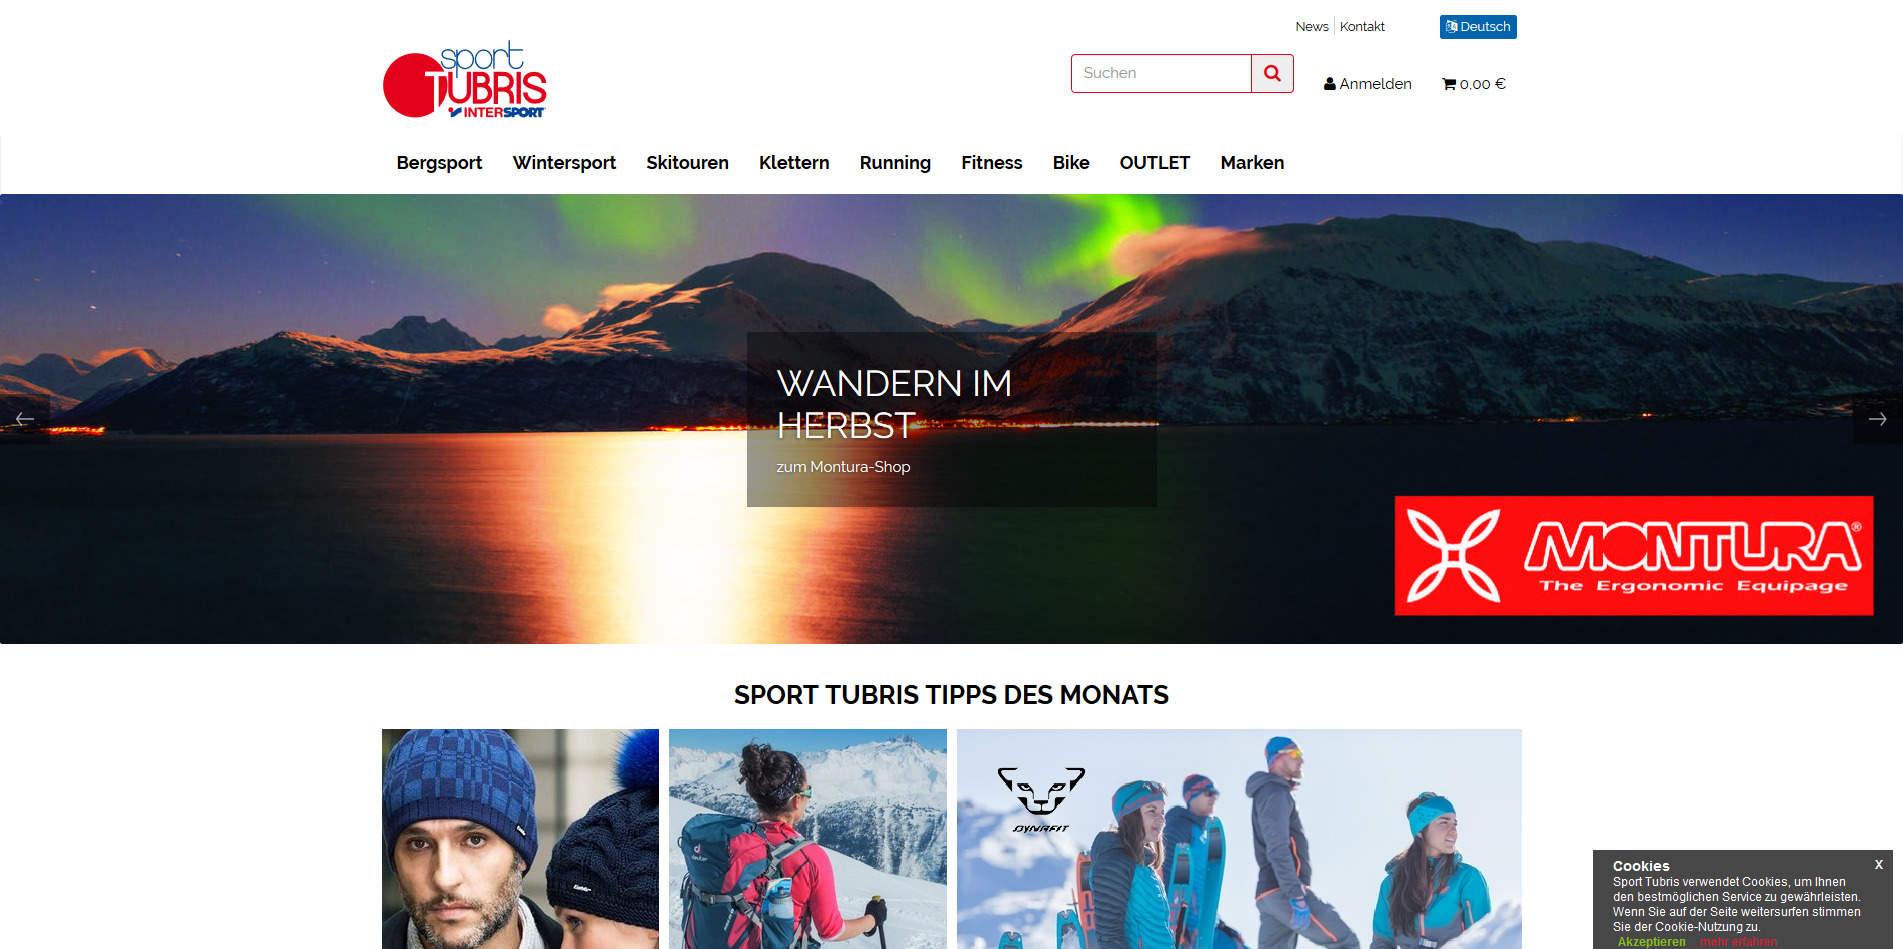 www.sport-tubris.com